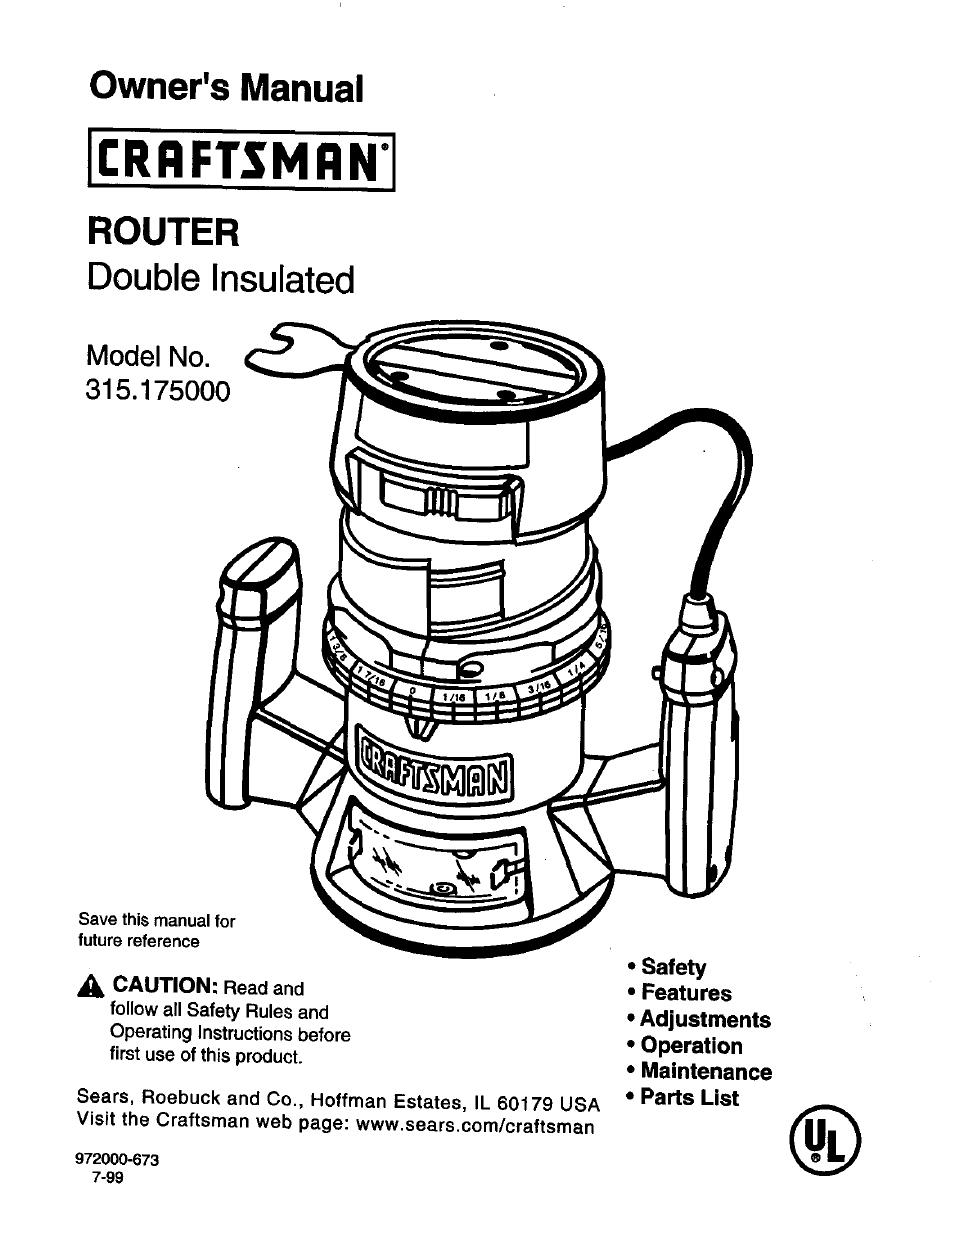 craftsman 315 175000 user manual 20 pages rh manualsdir com Craftsman Professional Router Table Manual 25444 Craftsman Router Table Manual